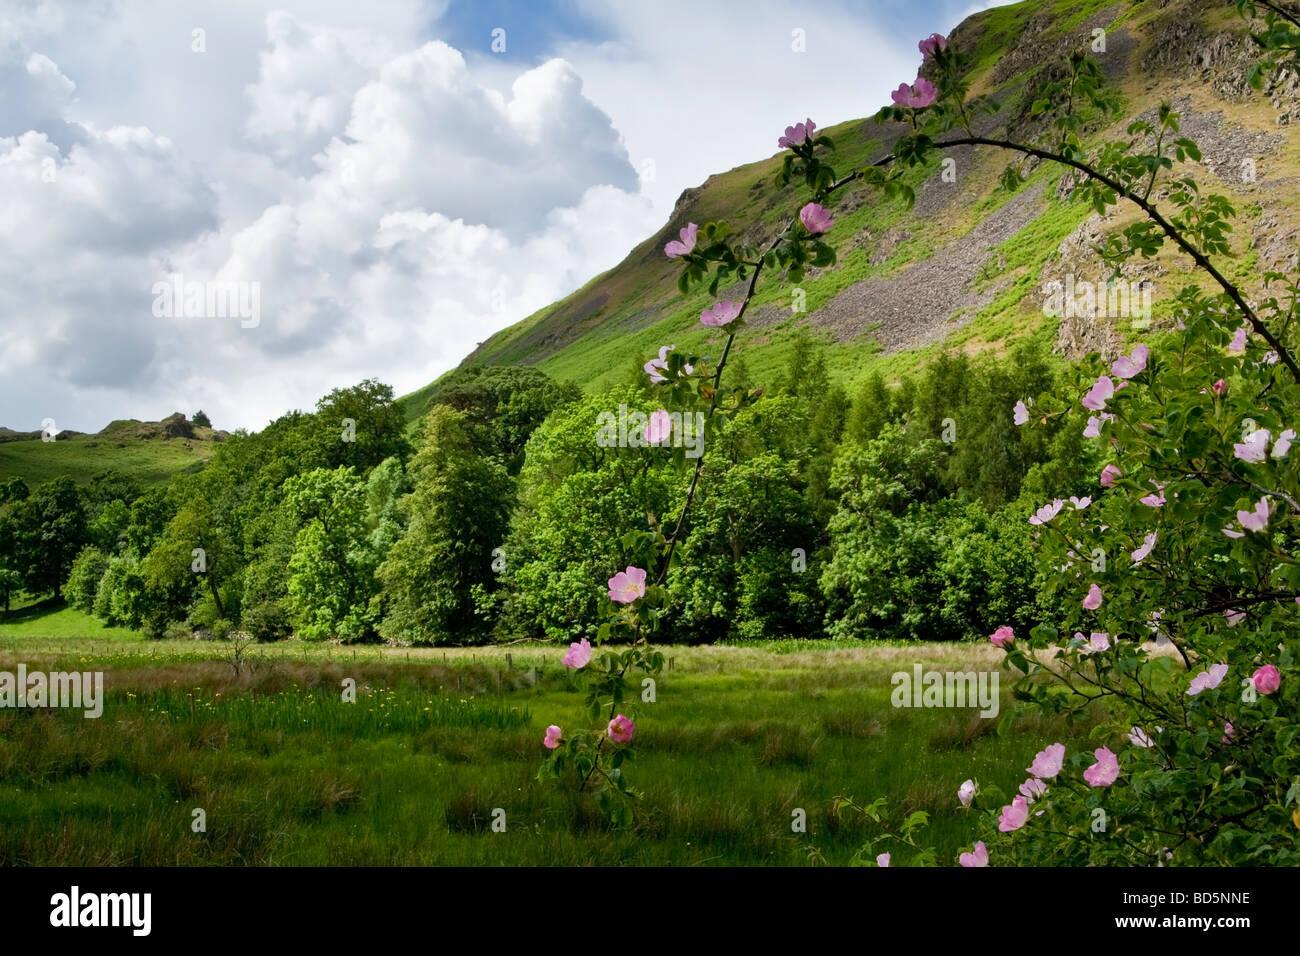 A Lakeland scene, the Lake District, Cumbria, UK. - Stock Image